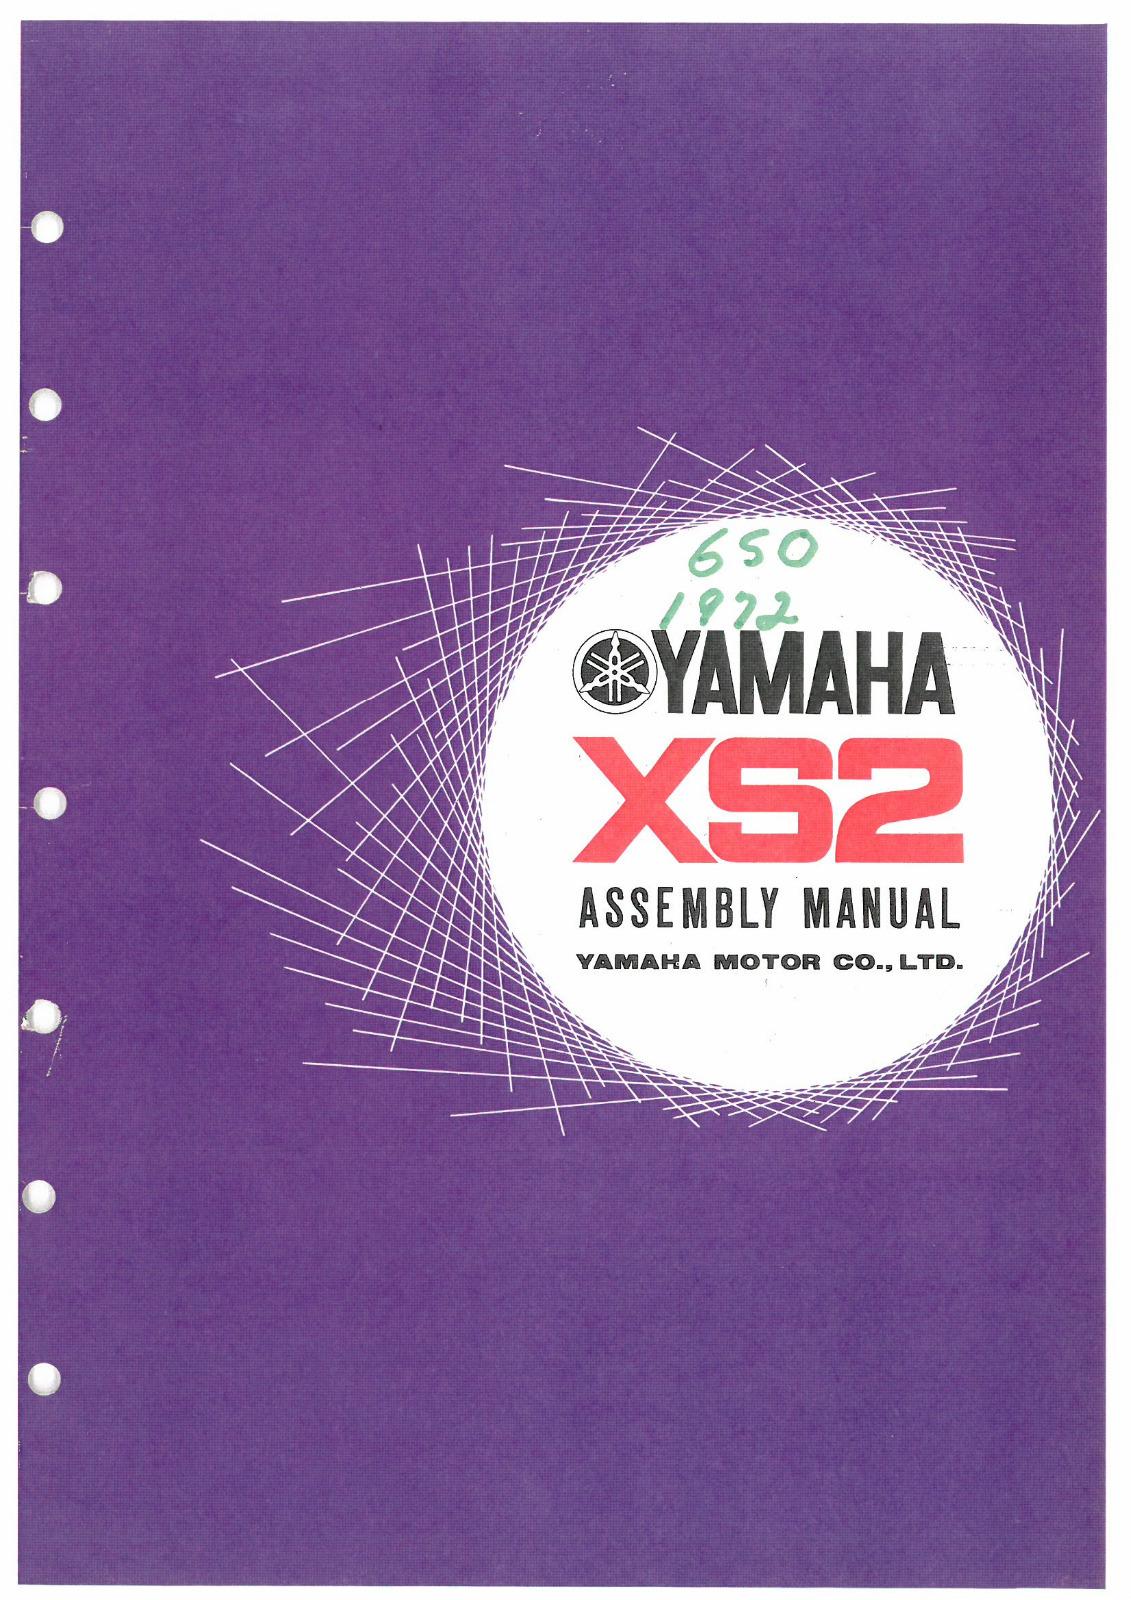 web 72 xs2 wiring diagram yamaha xs2 parts \u2022 indy500 co XS2 Bow String at readyjetset.co